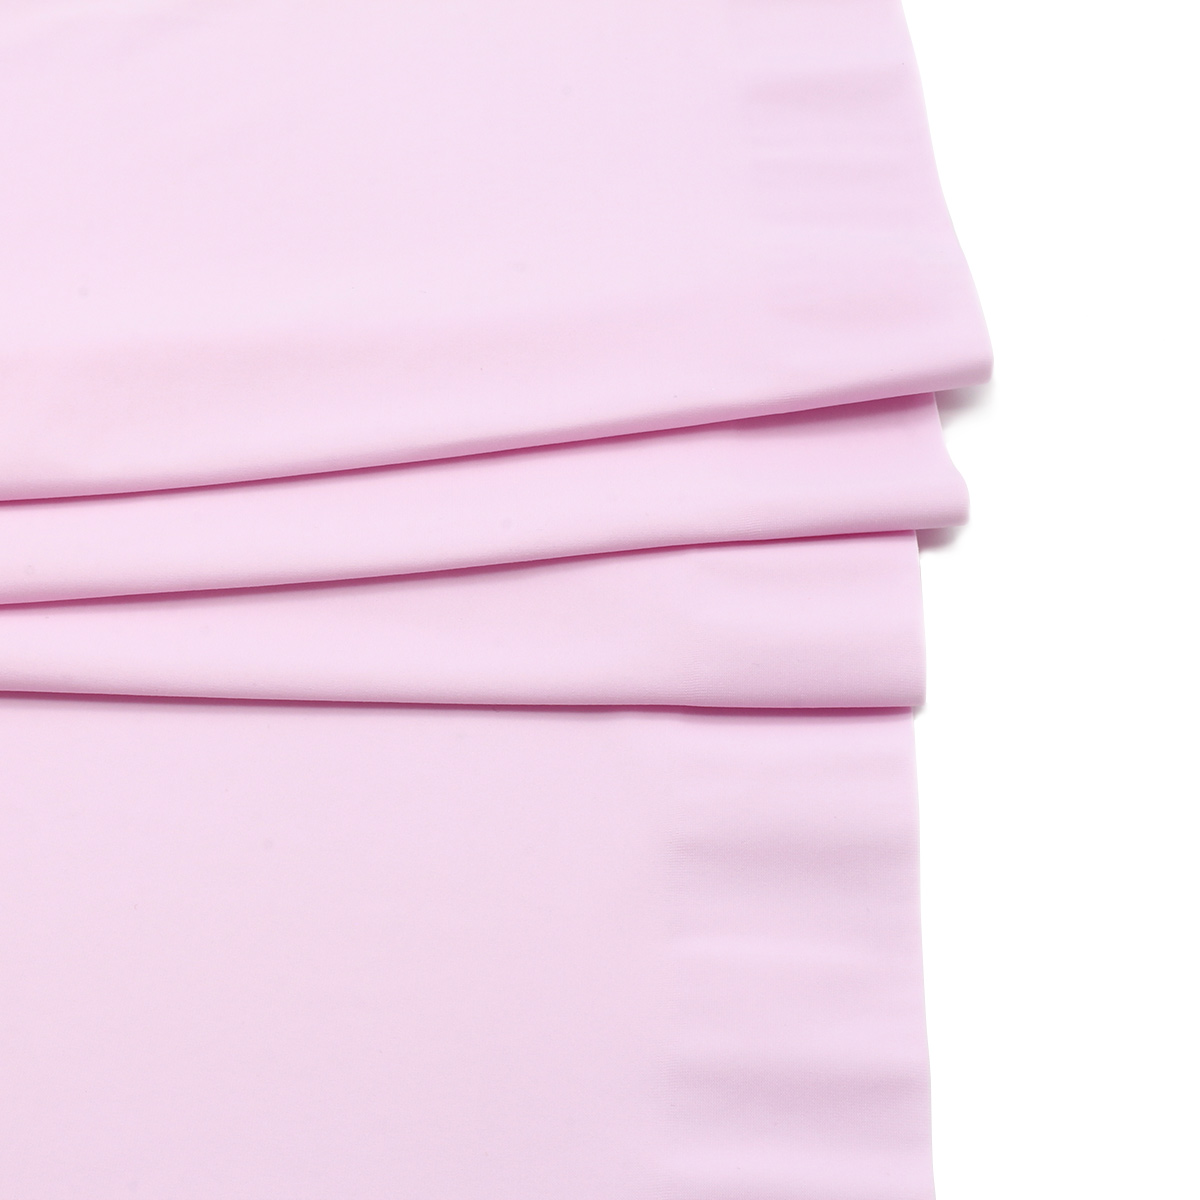 SU 58 Ткань эластичная бельевая 24 см*10